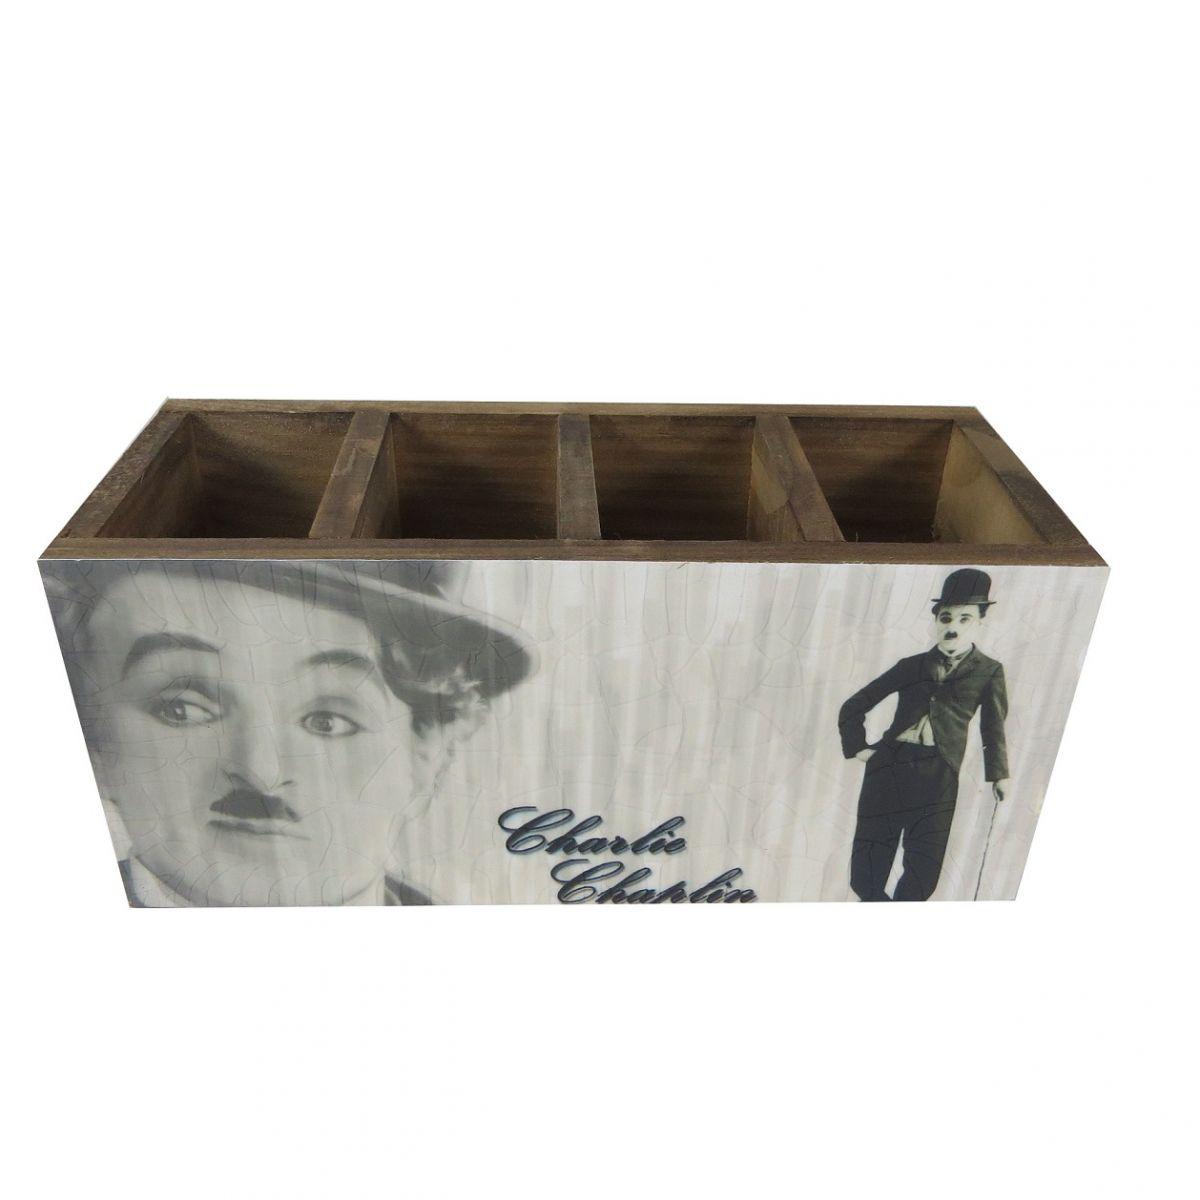 Porta Controle e Objetos Charles Chaplin Vintage Concept